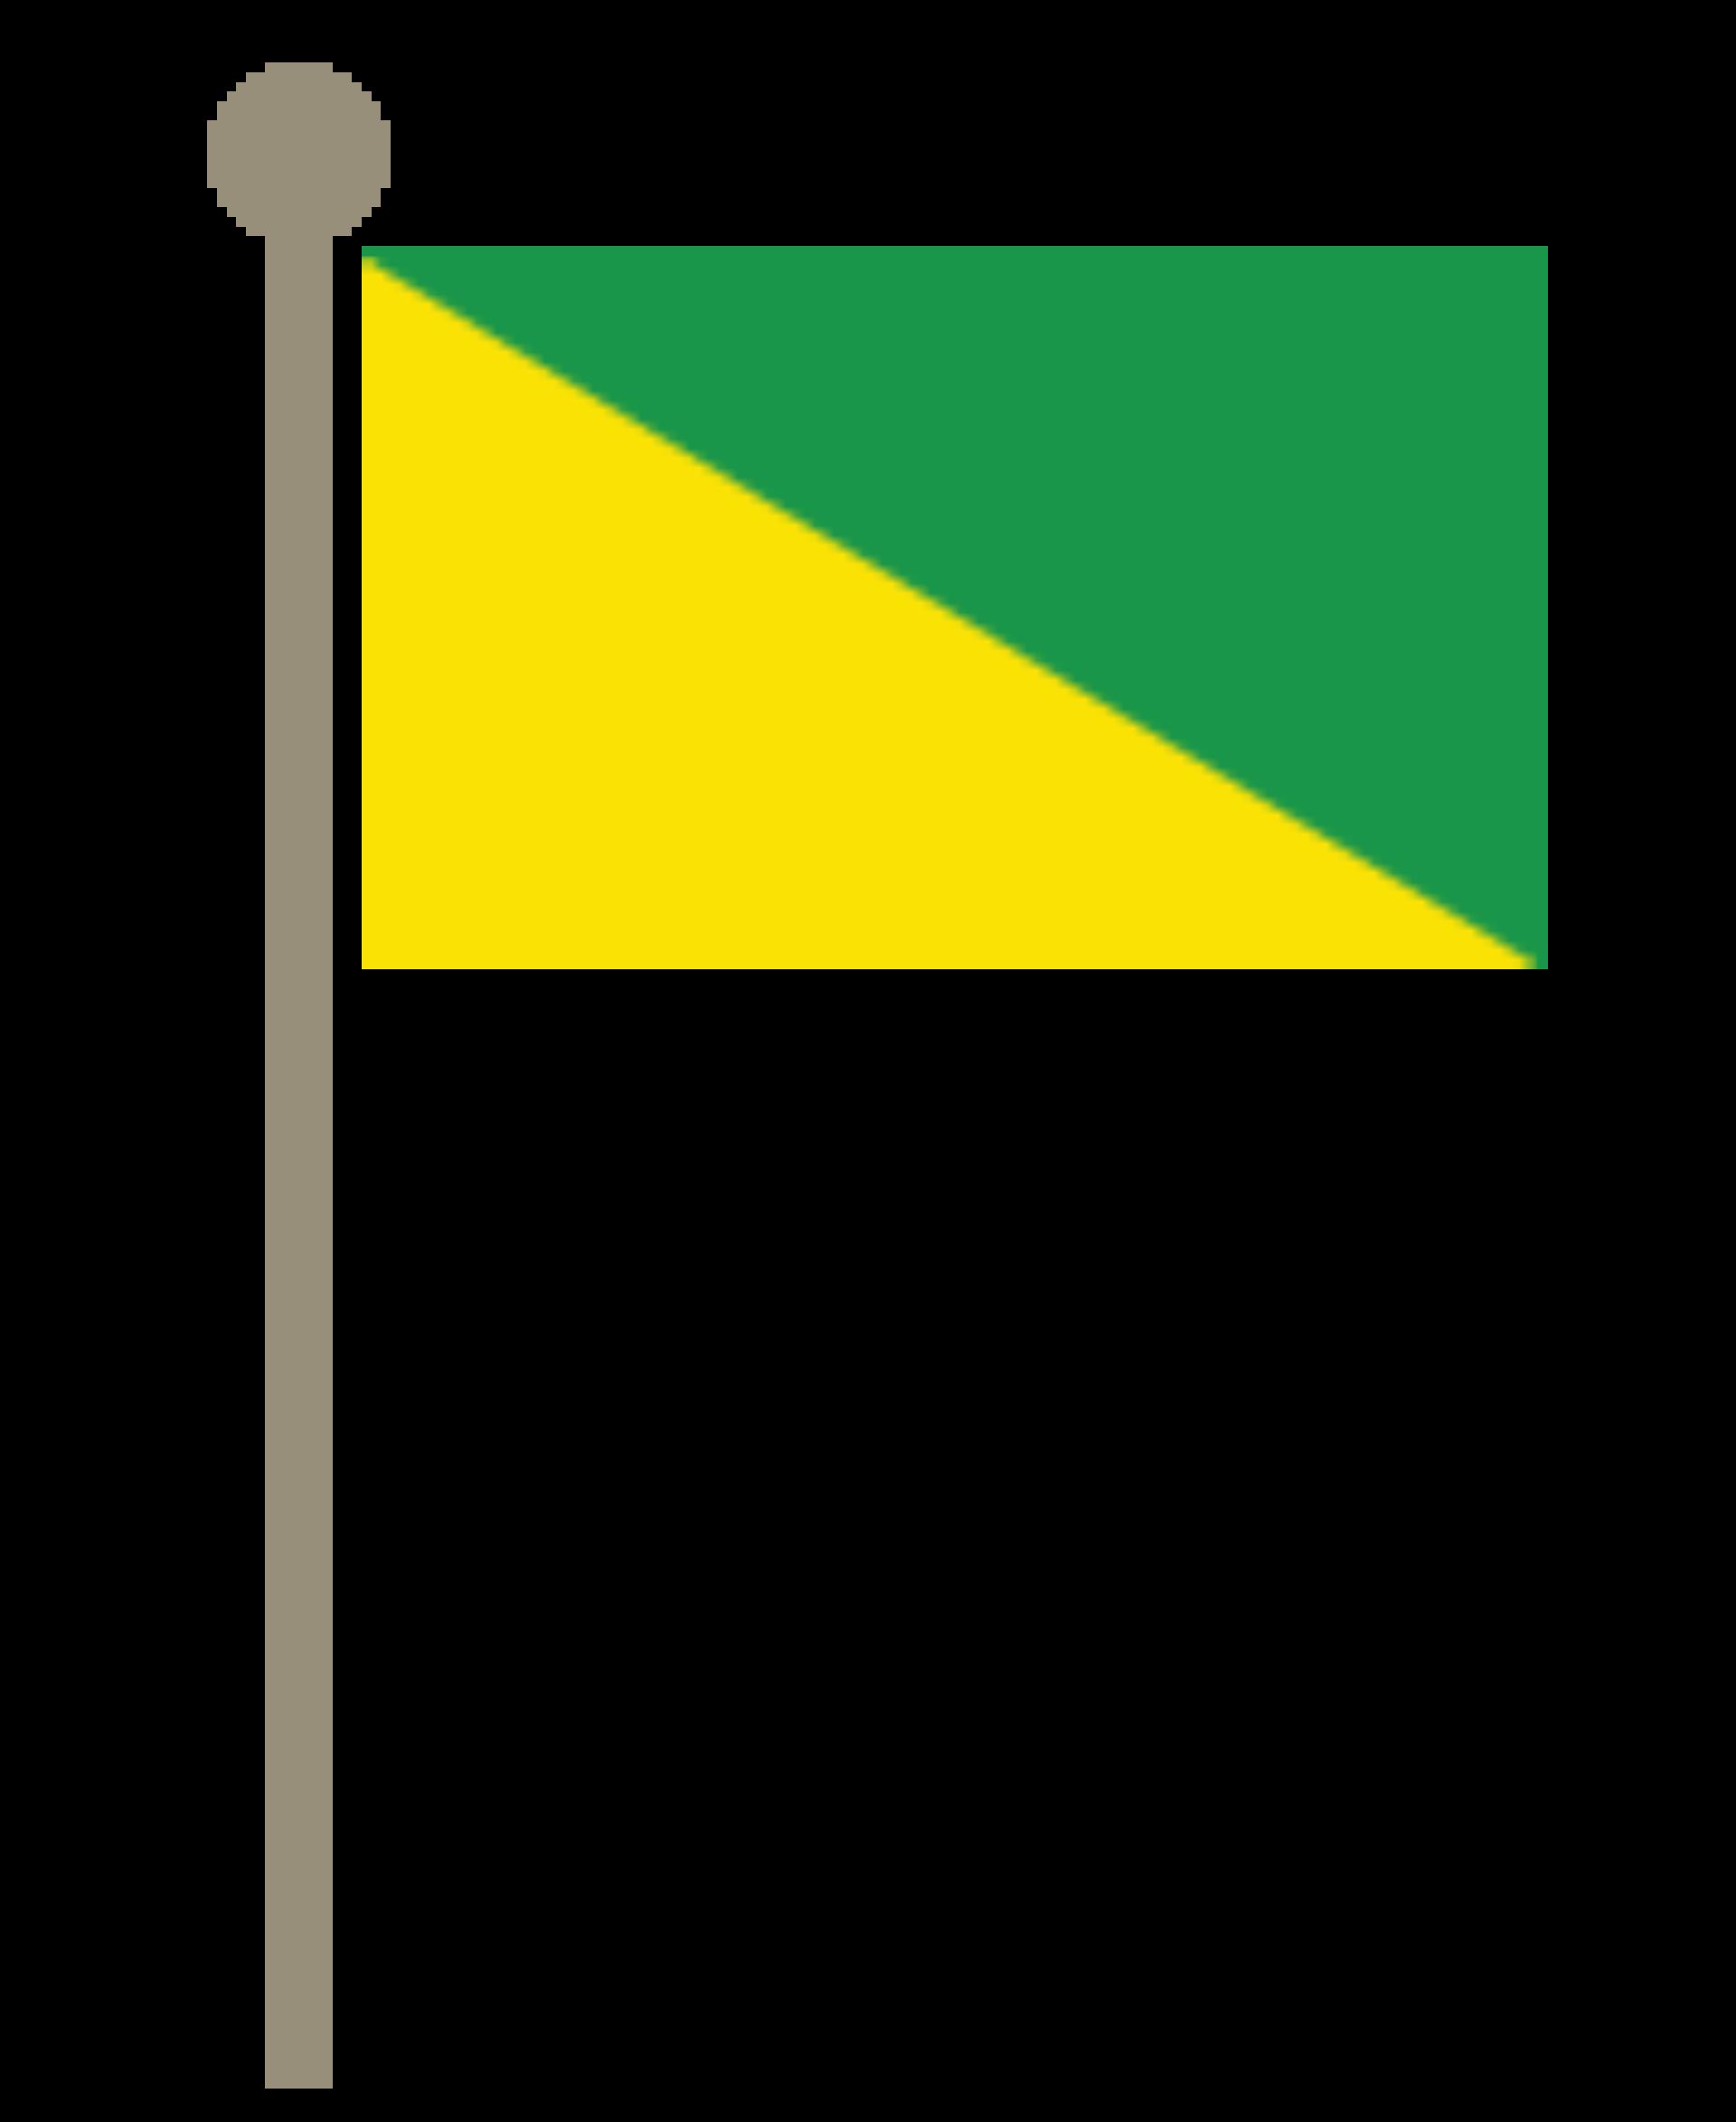 Greenyellowflag